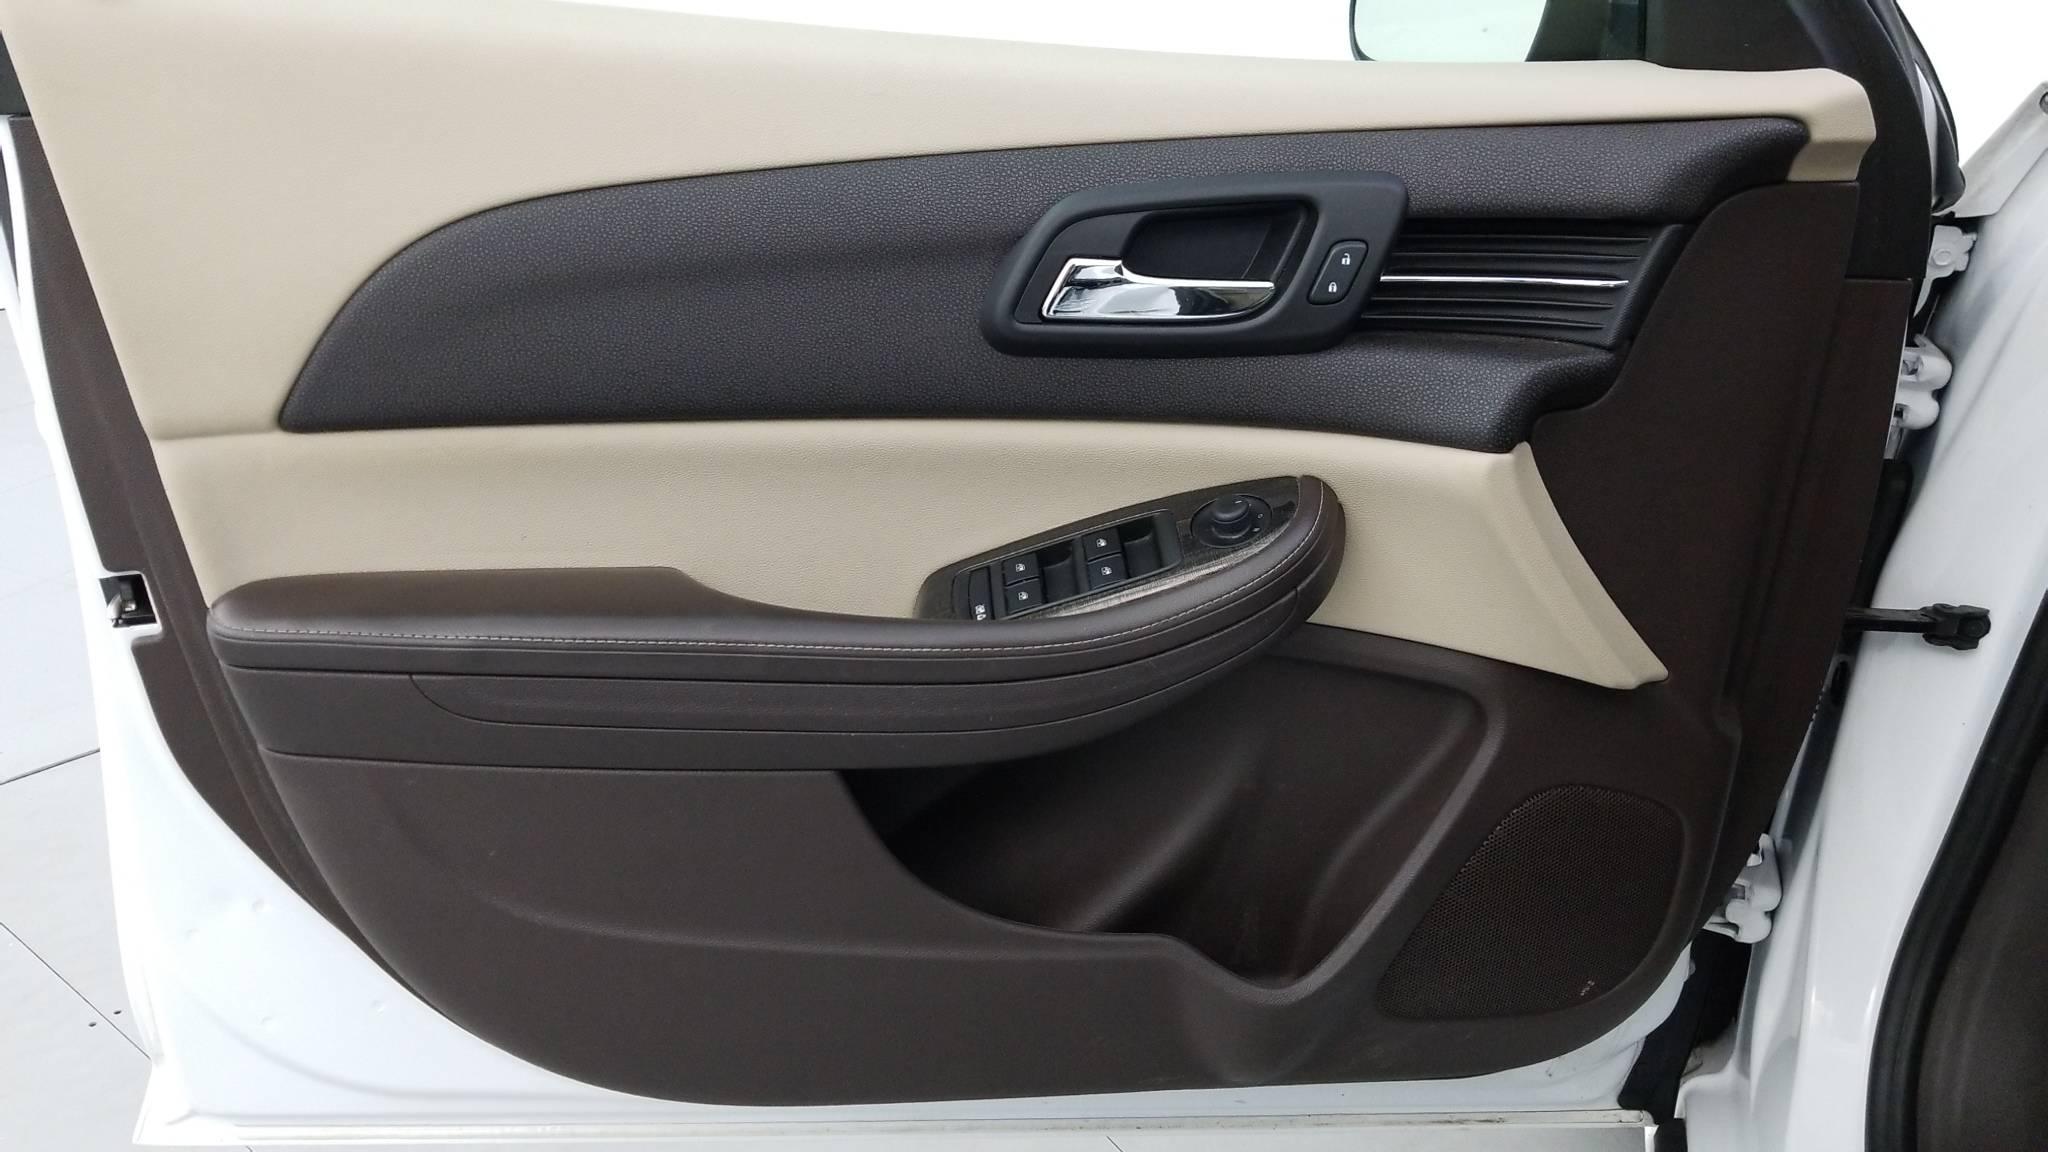 Pre-Owned 2014 Chevrolet Malibu LT